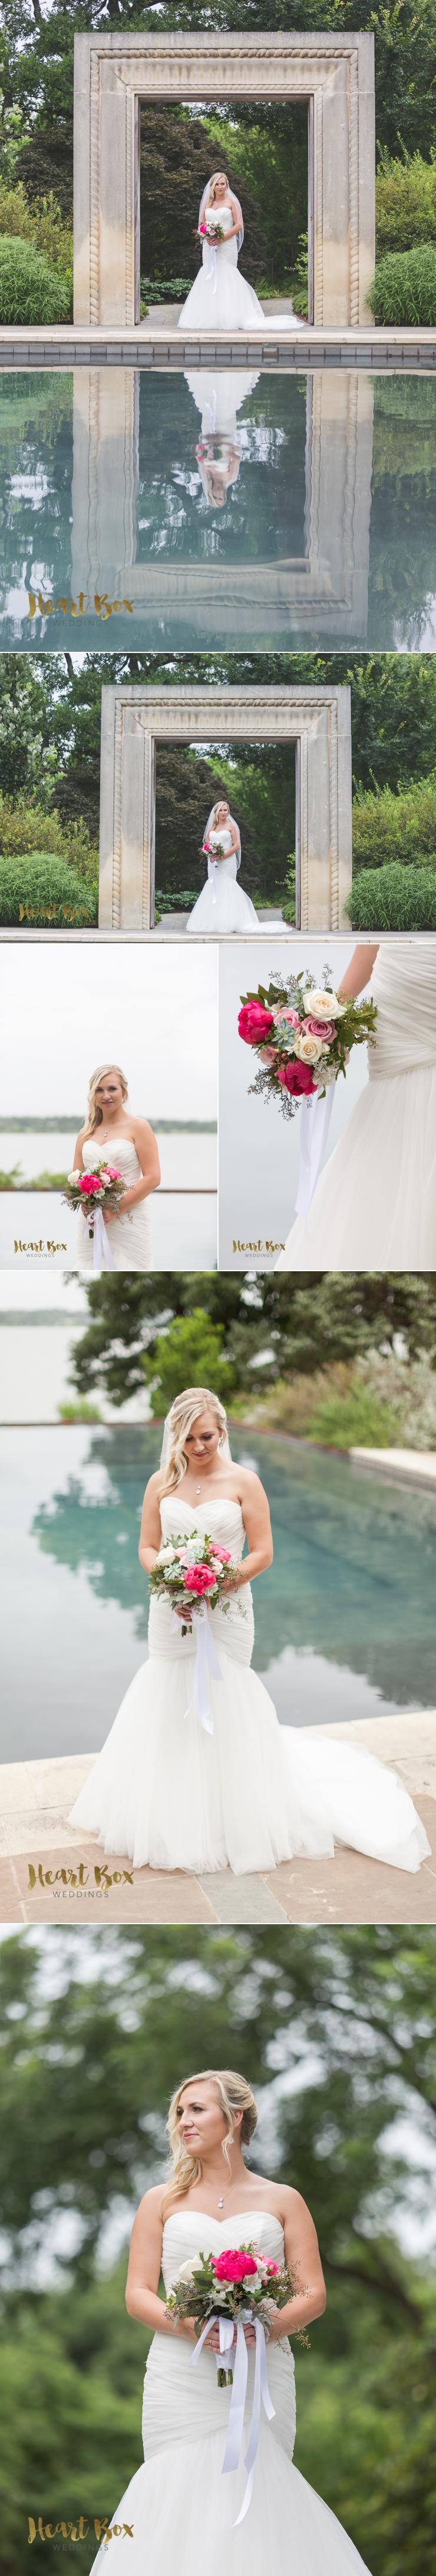 Karlee Bridal Blog Collages 6.jpg